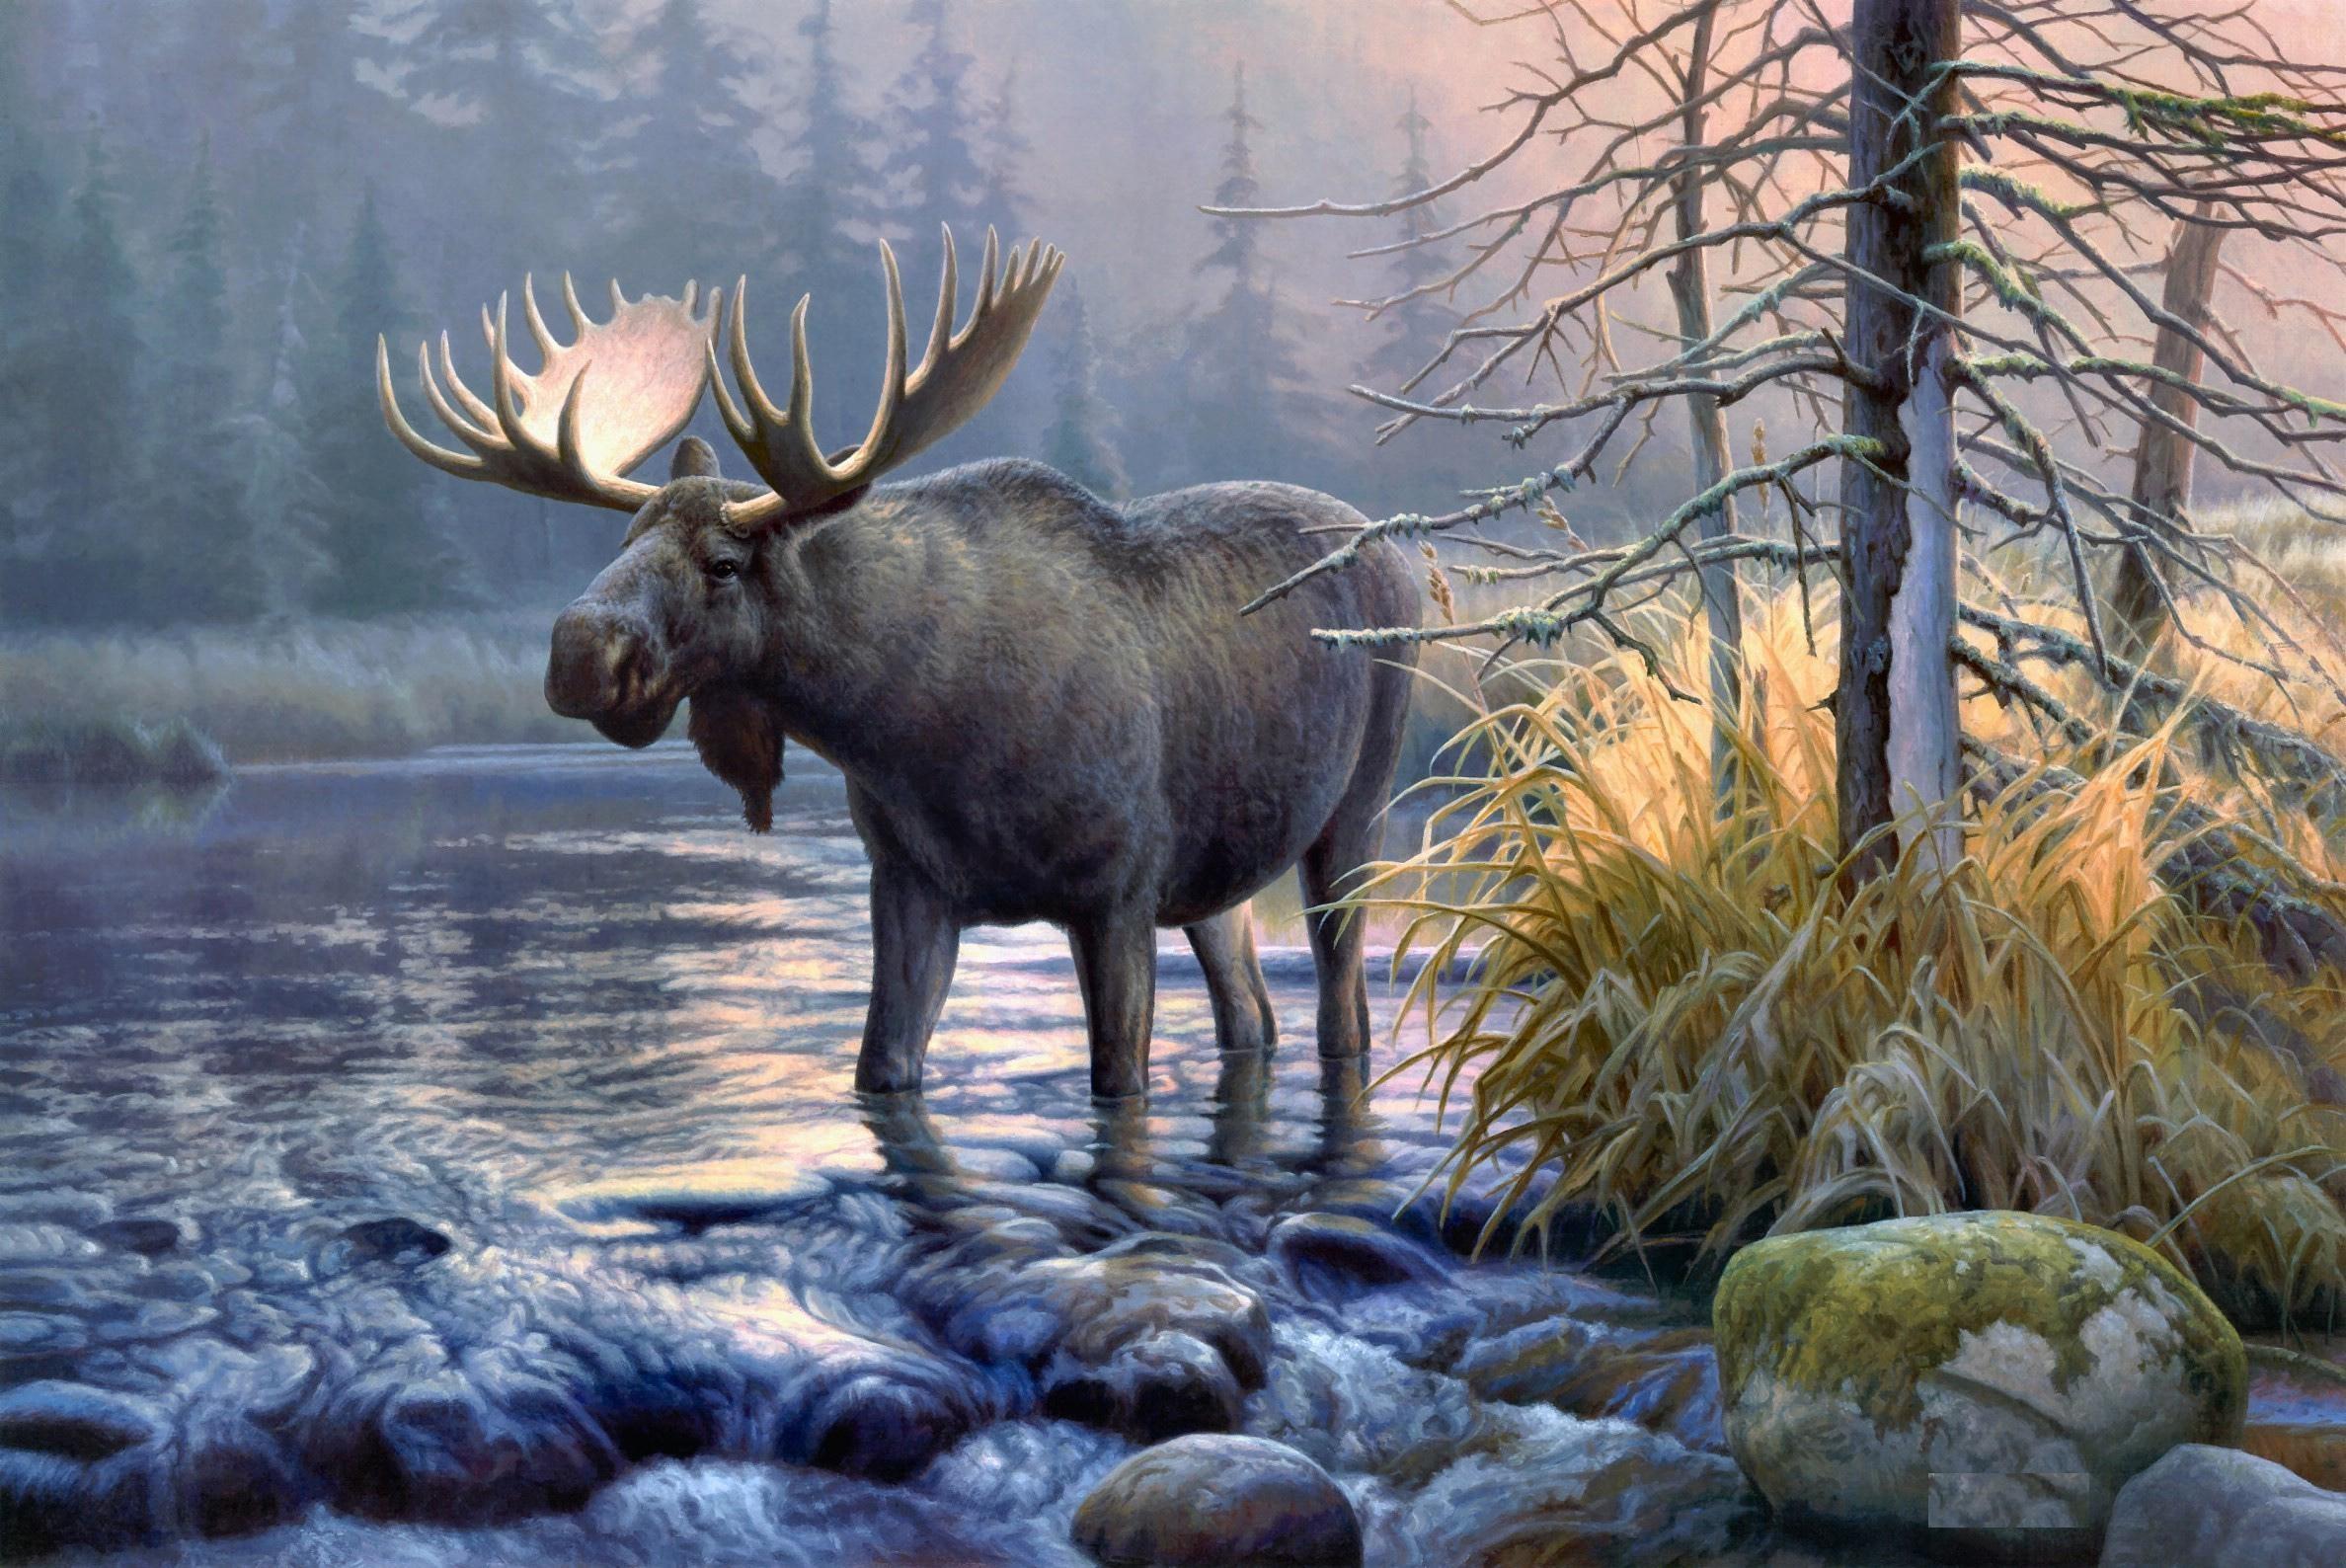 Moose HD Wallpapers | Moose Desktop Pictures | Cool Wallpapers